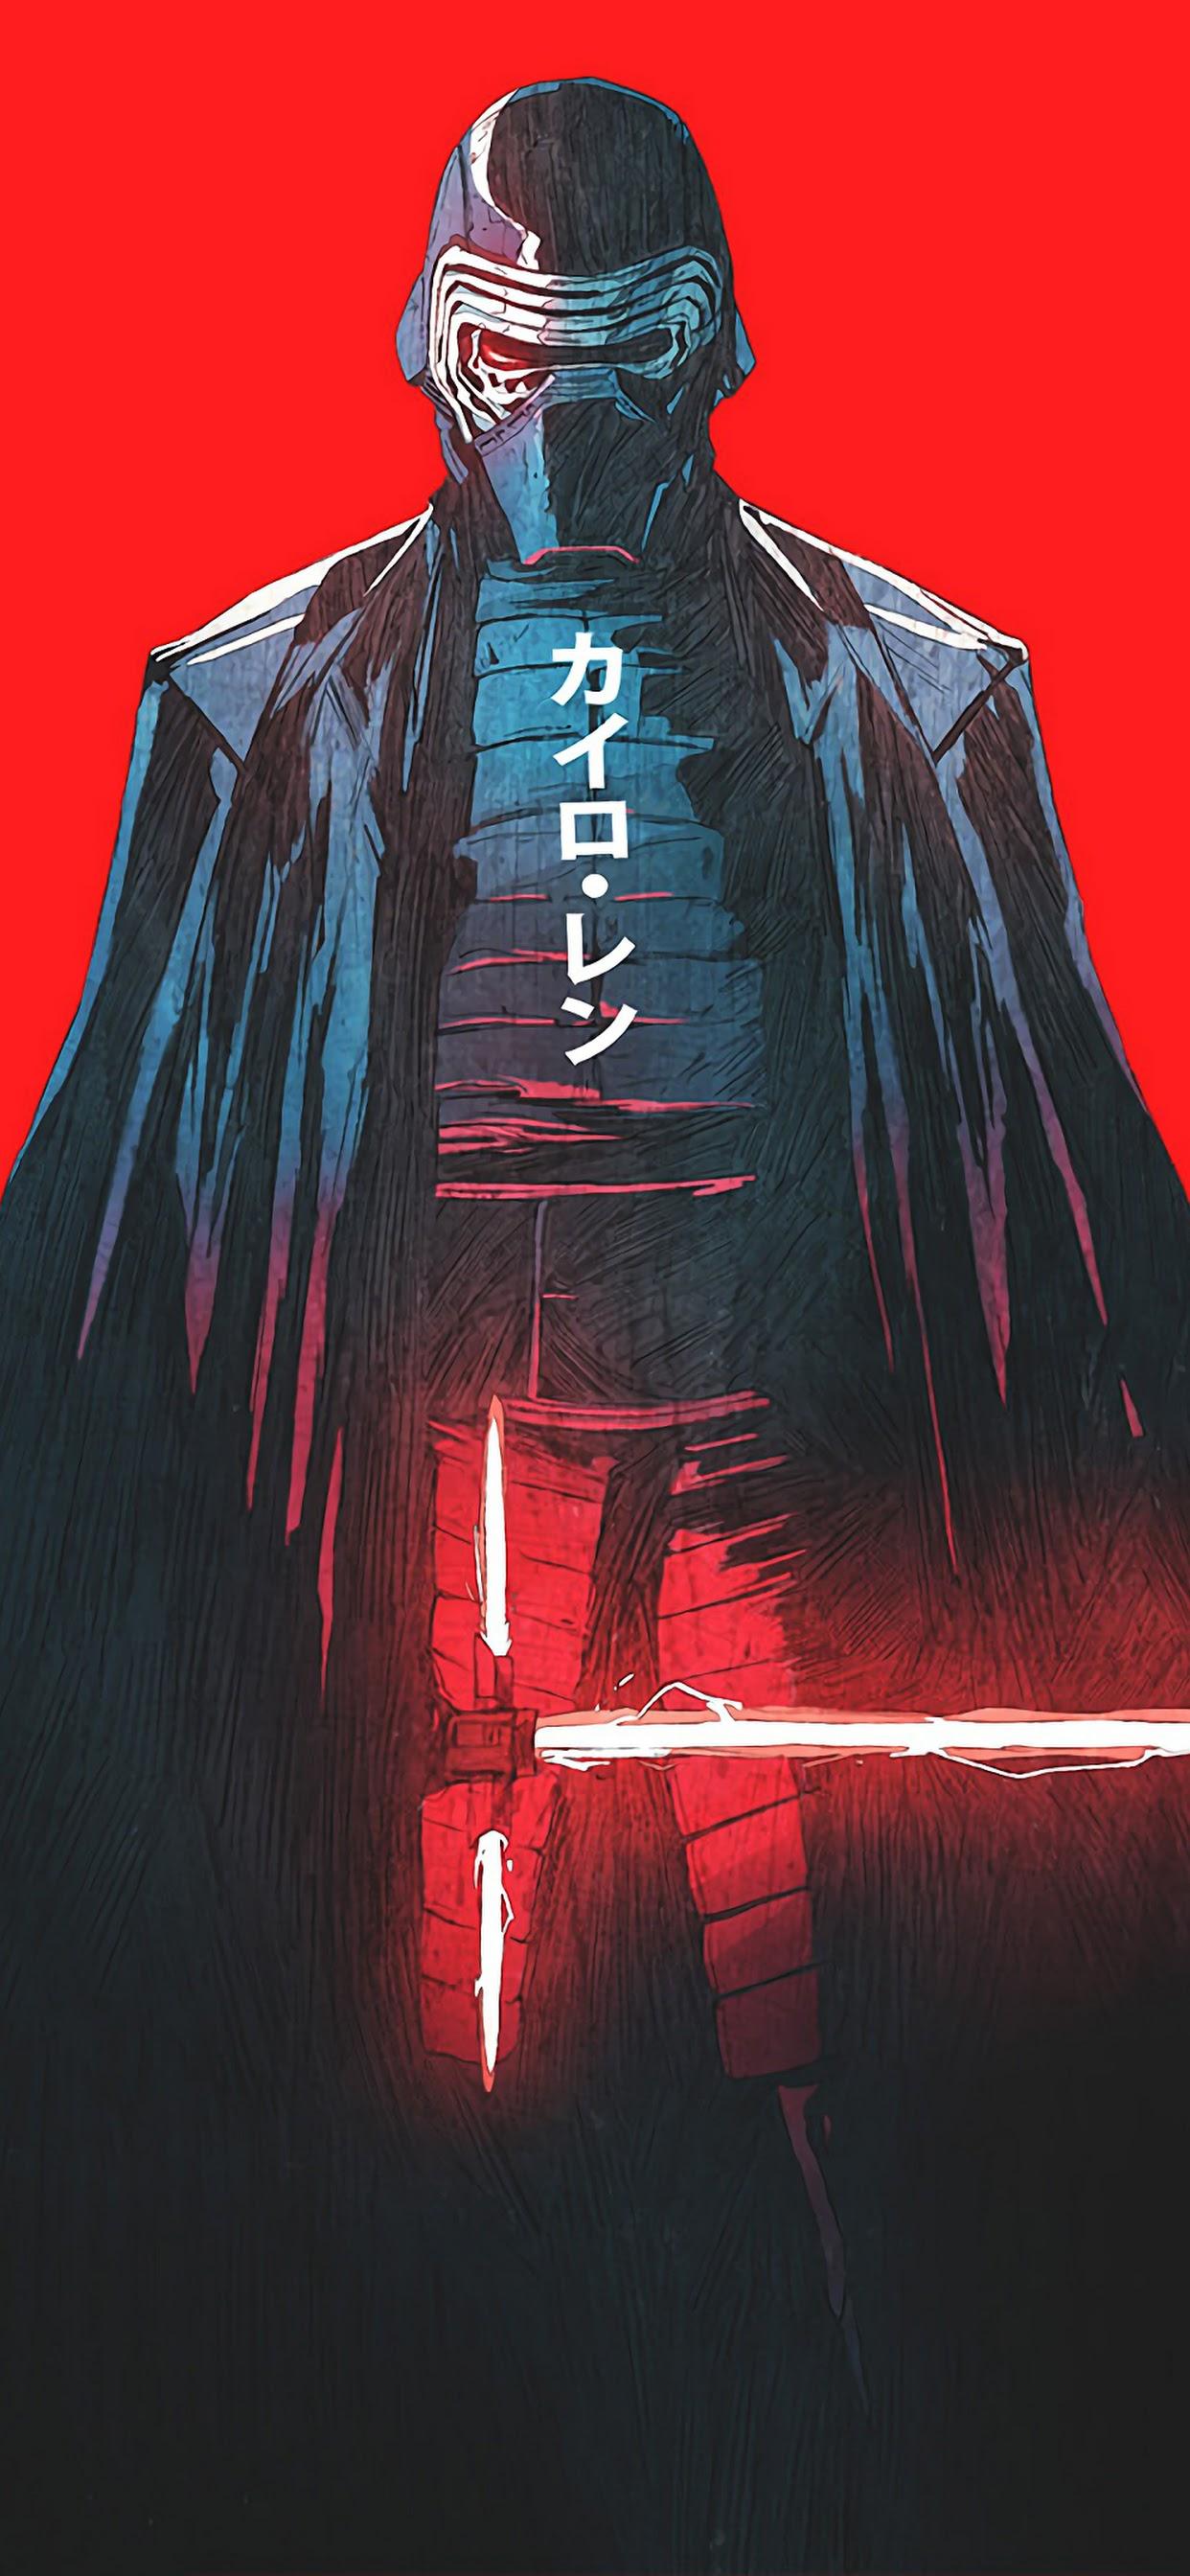 Kylo Ren Lightsaber Star Wars Sci Fi 4k 3840x2160 Wallpaper 26